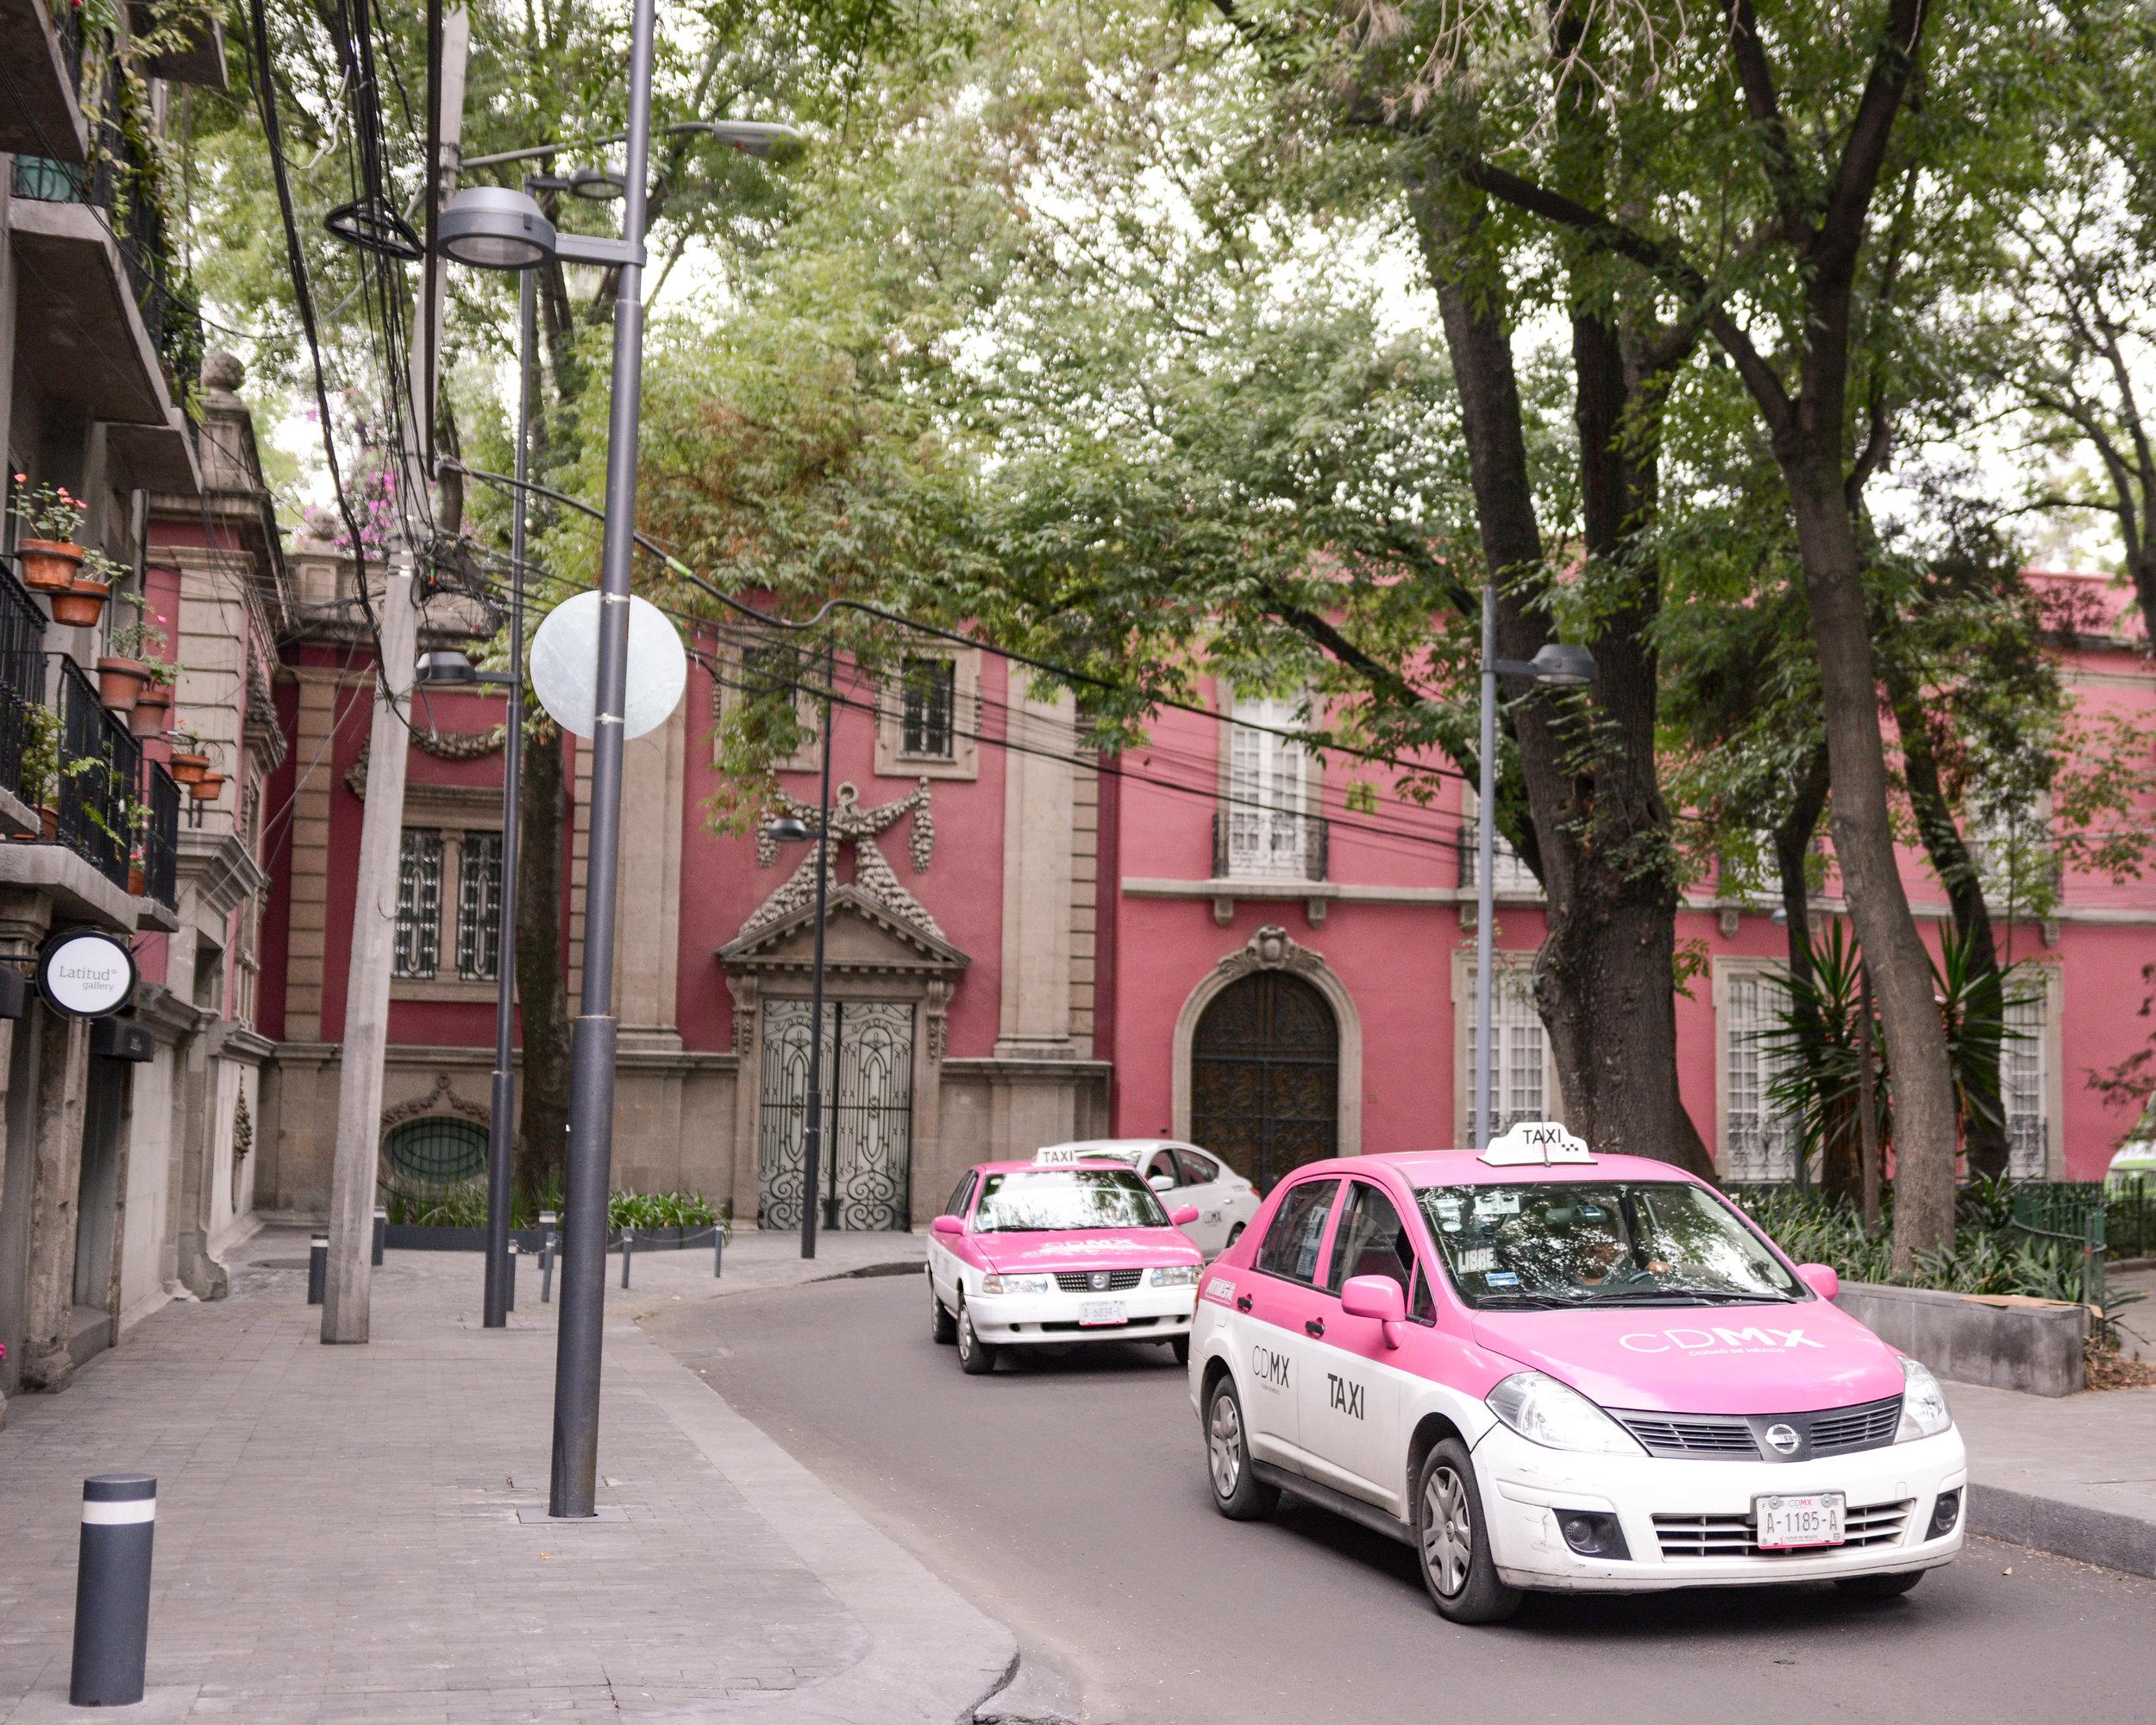 Pink CDMX Taxis, Mexico City